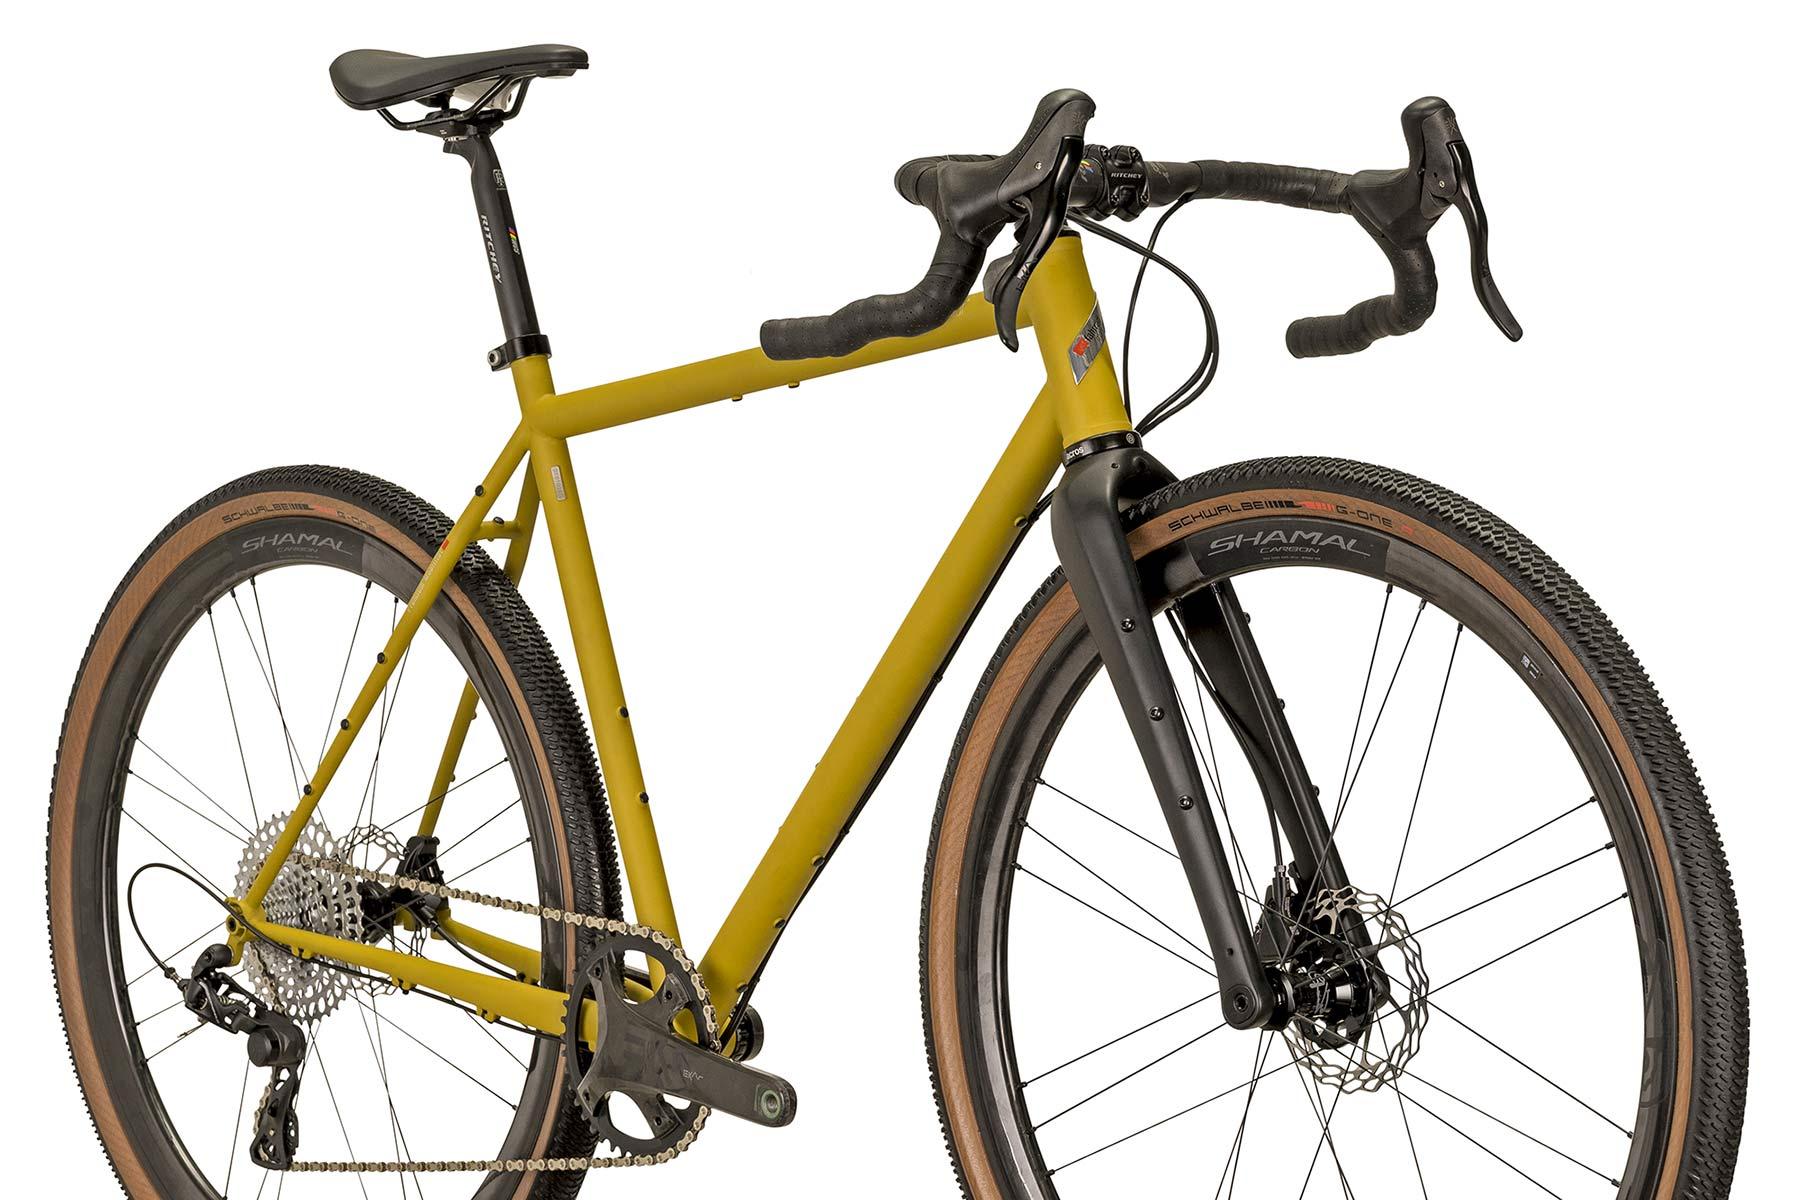 VSF Fahrradmanufaktur GX-1200 limited edition steel gravel bike, made-in-Germany, angled